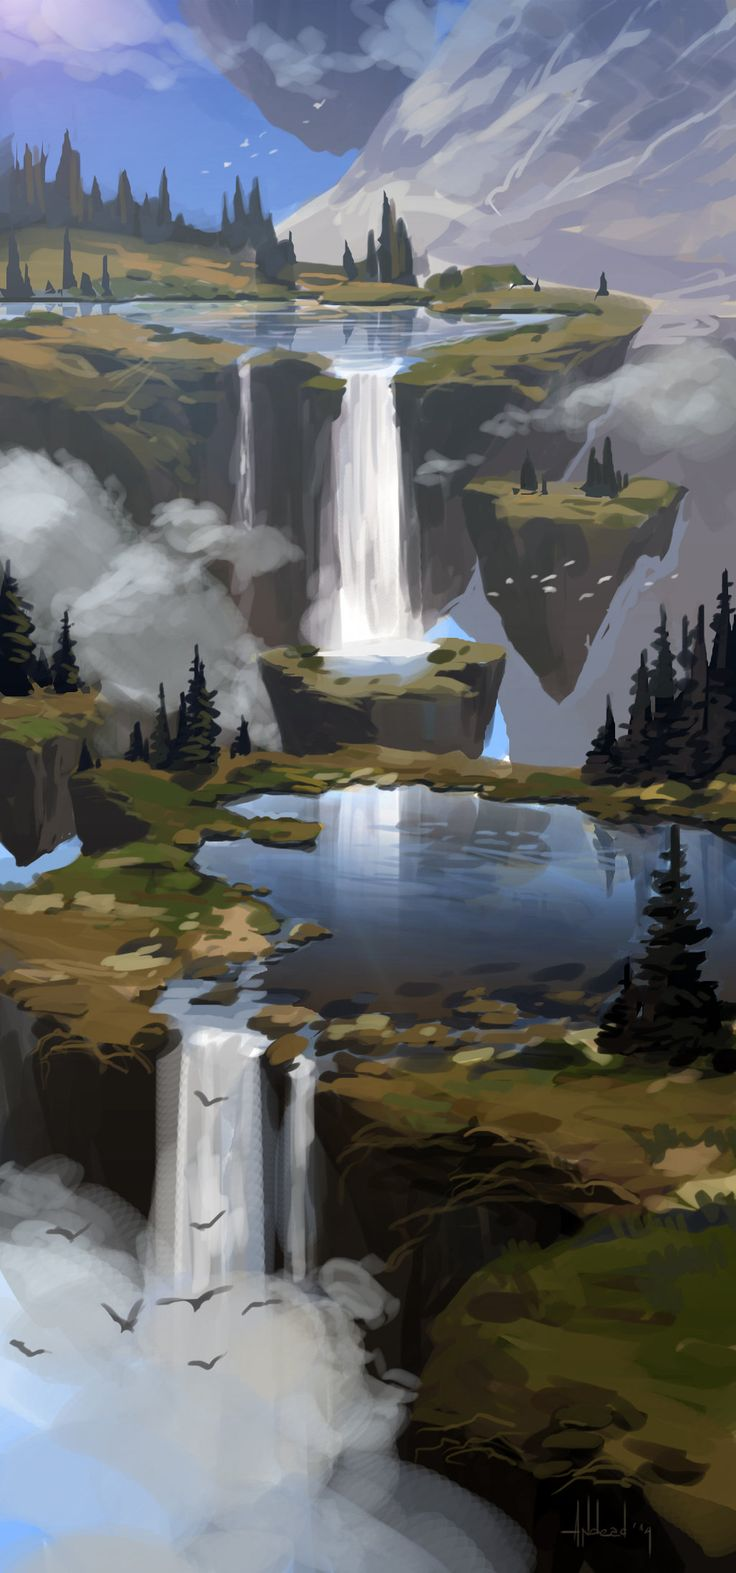 Mountain pond by Andead.deviantart.com on @deviantART